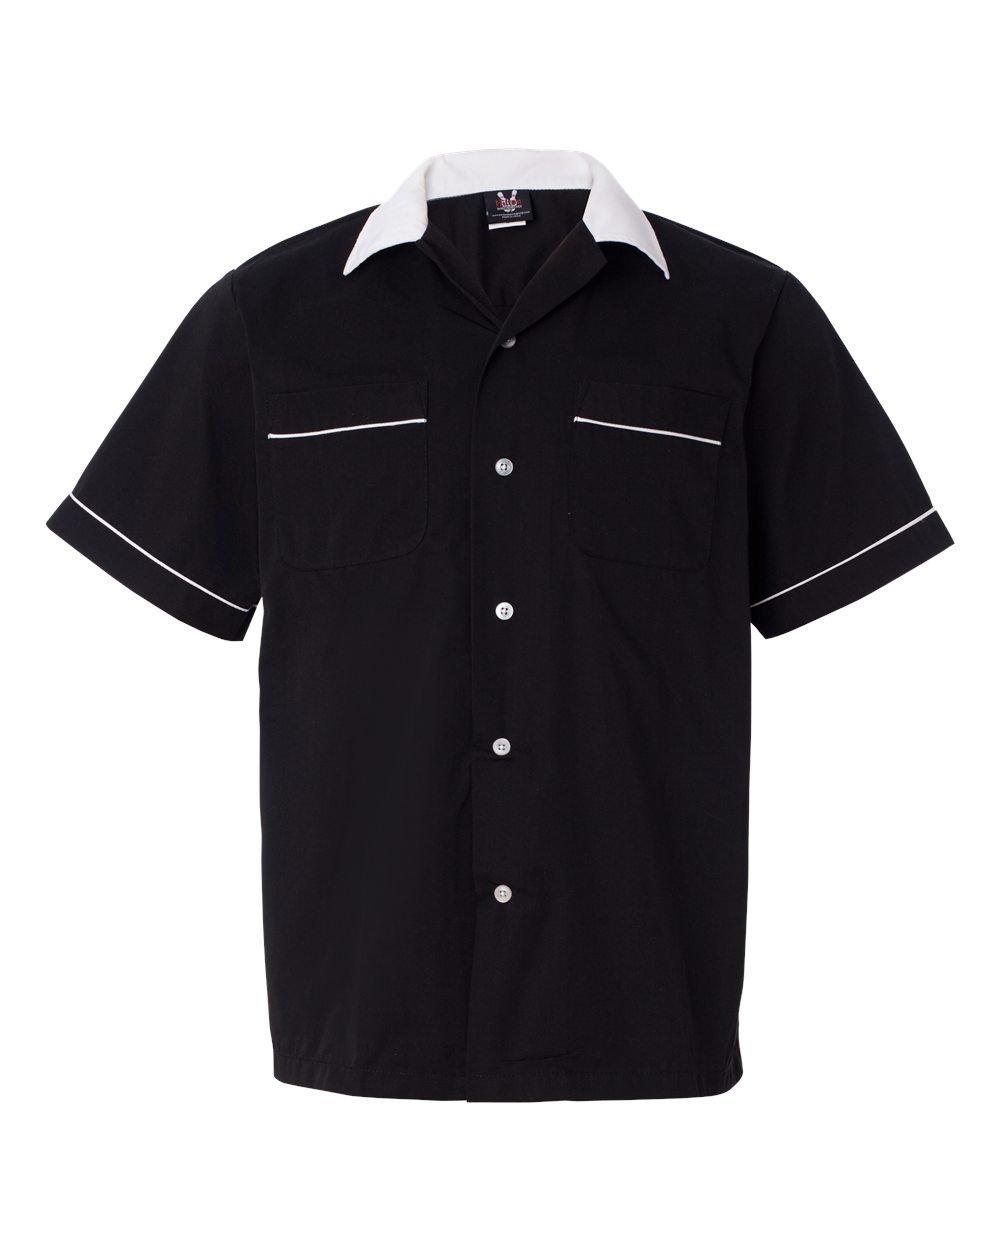 Hilton Men's Retro Legend Bowling Shirt, Black/ White, Small